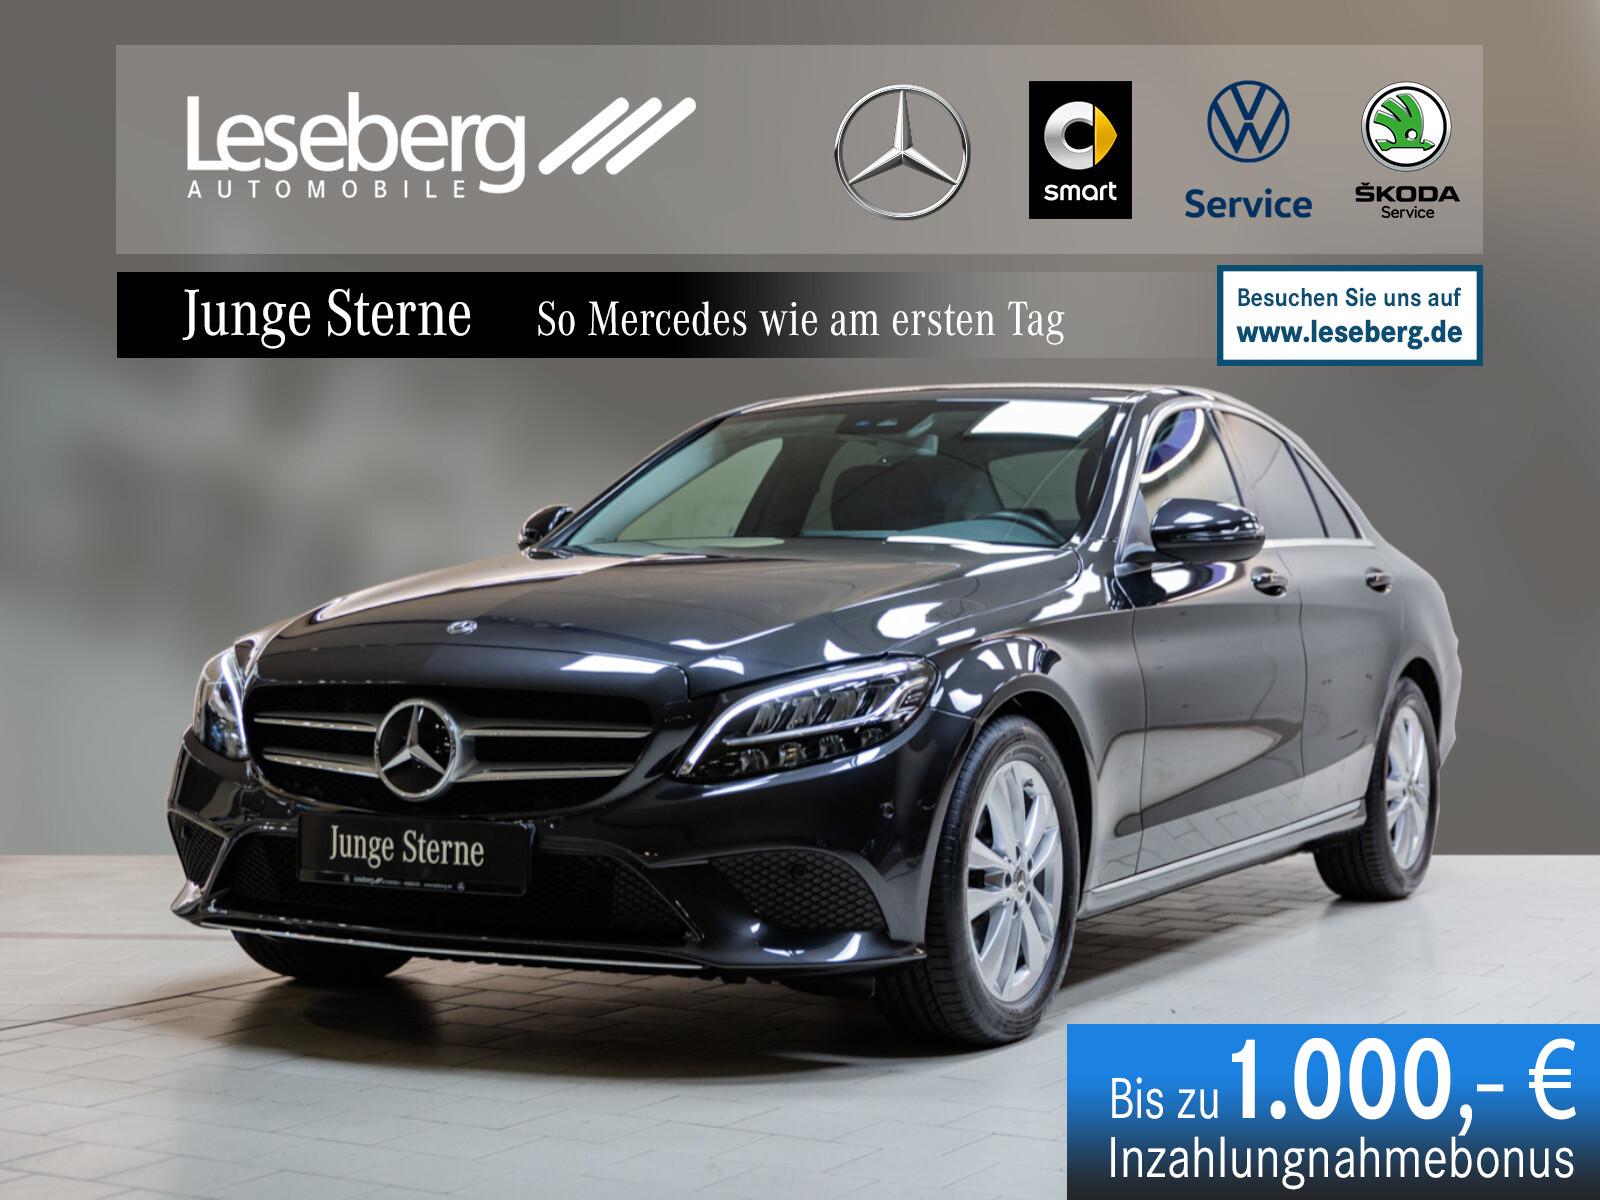 Mercedes-Benz C 180 Avantgarde/Kamera/LED/9G-Tronic/Navigation, Jahr 2020, Benzin